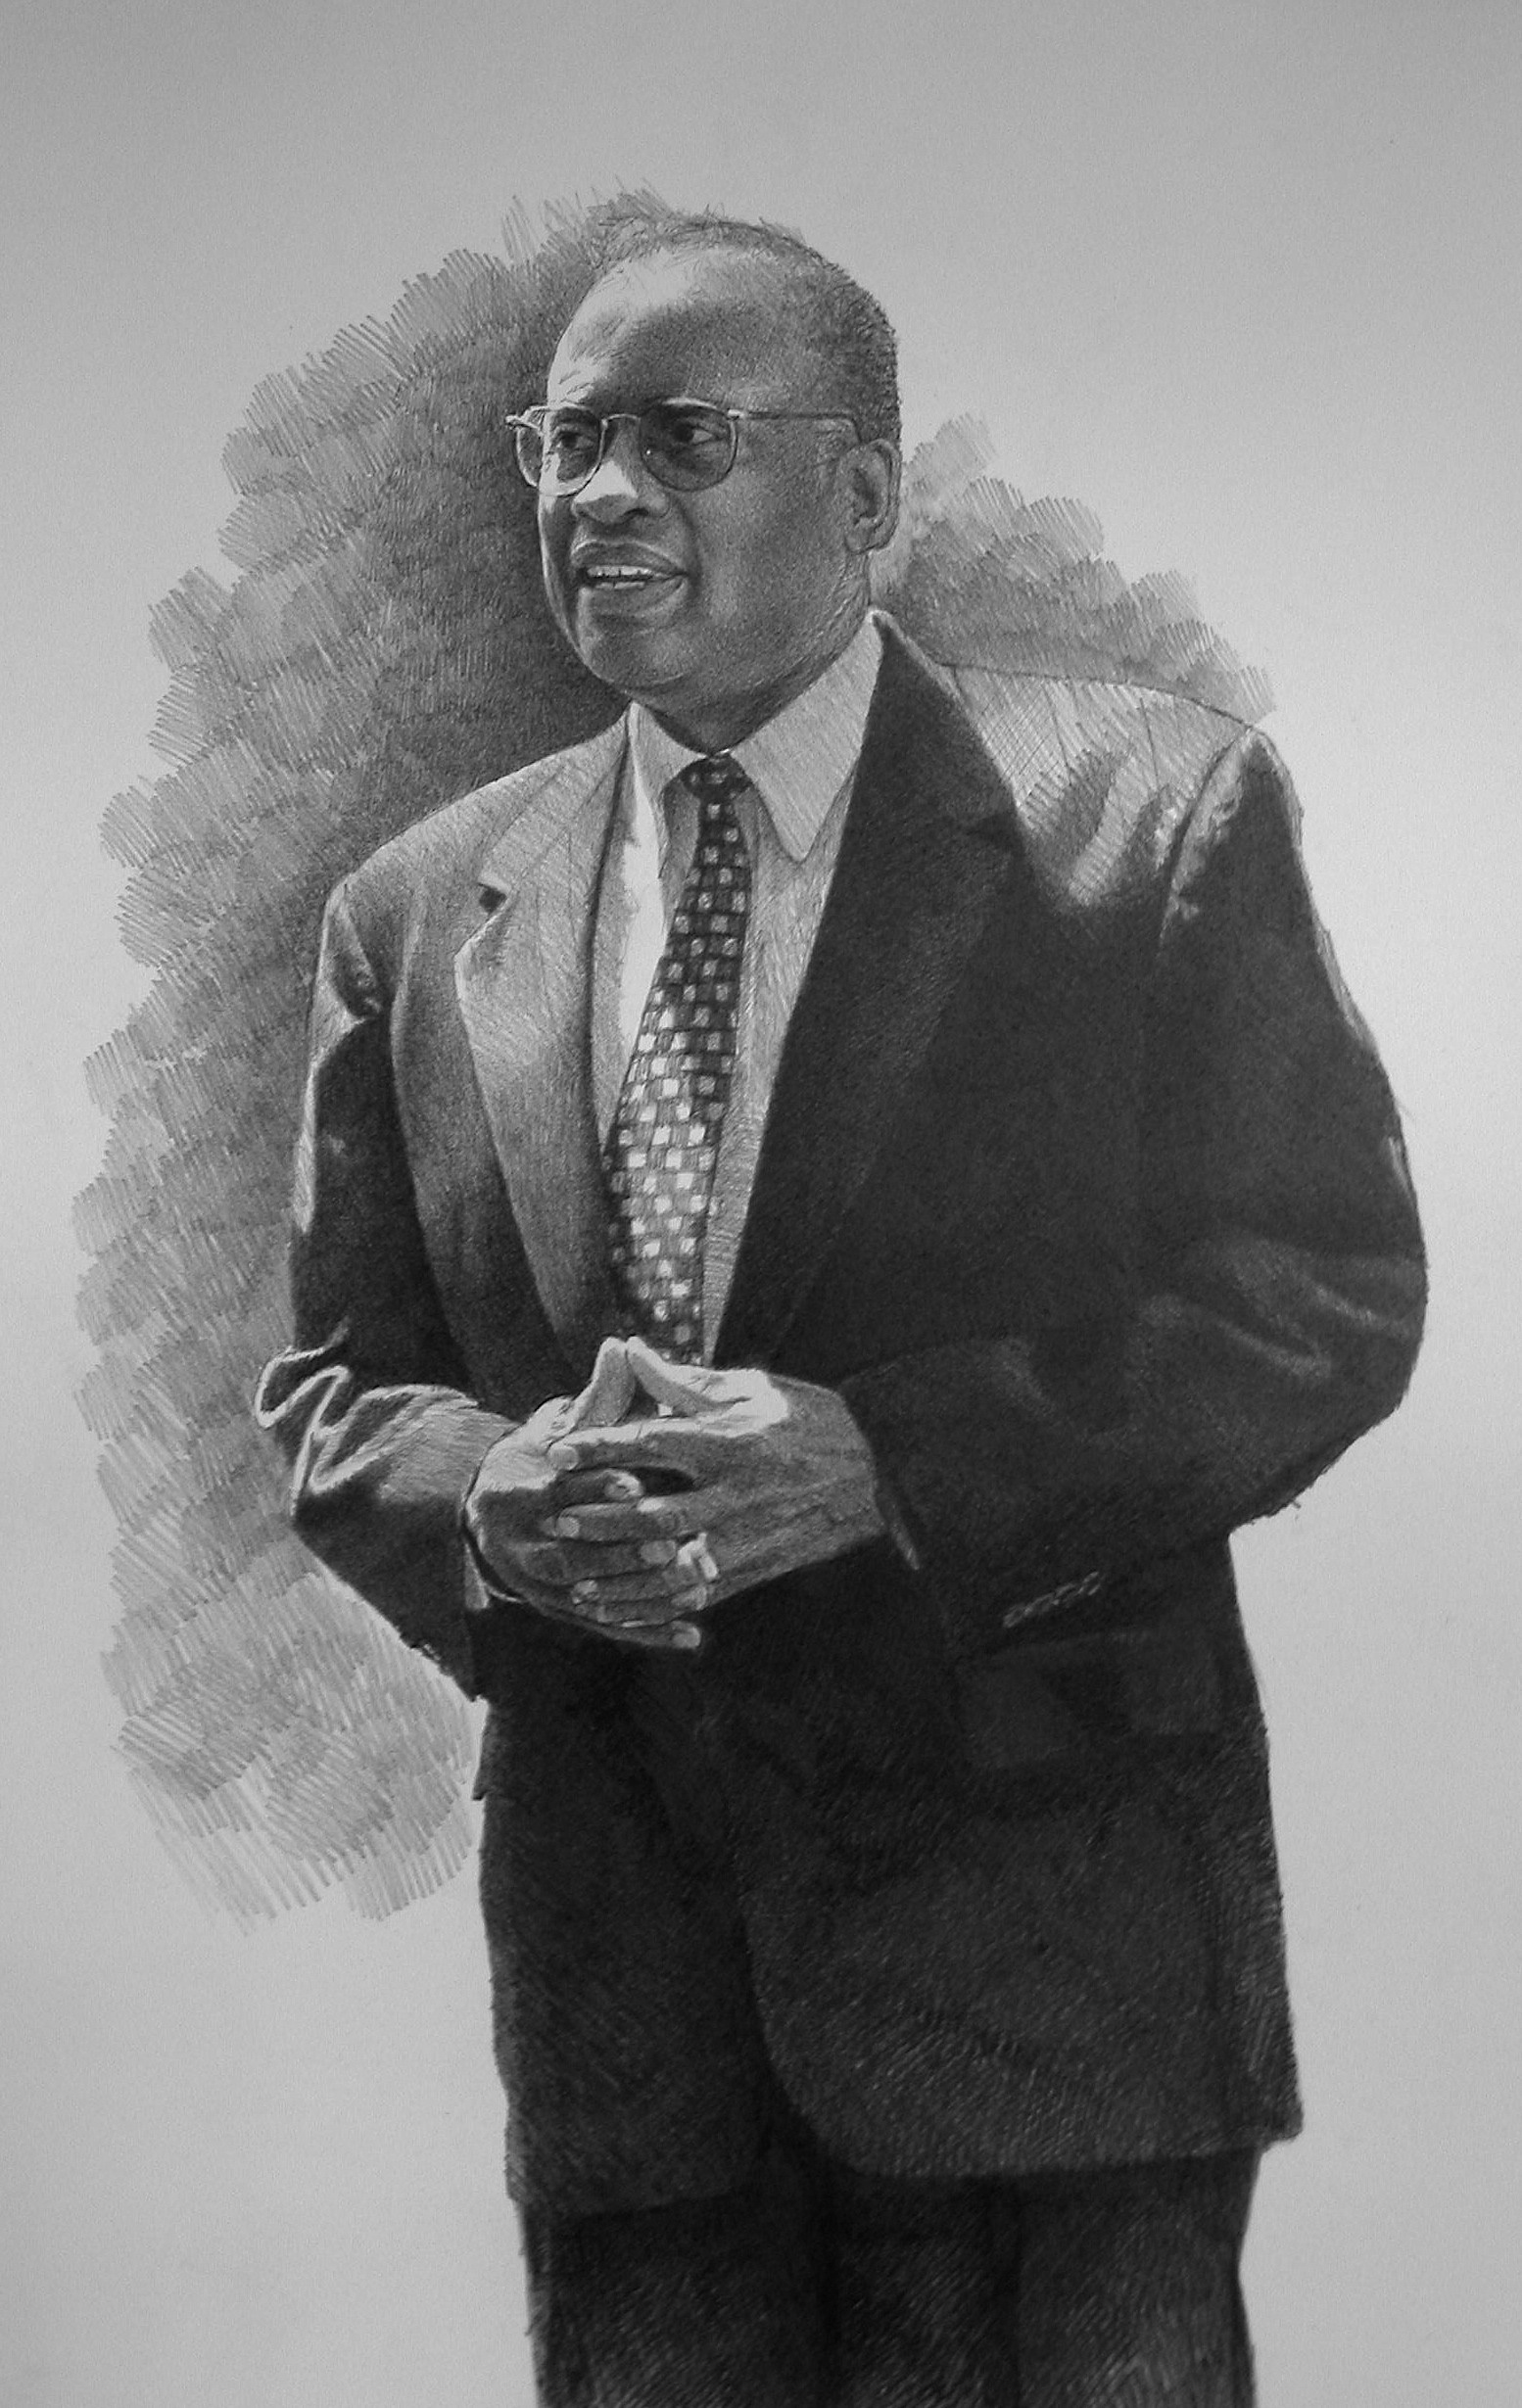 James Thomas, Yale Law School